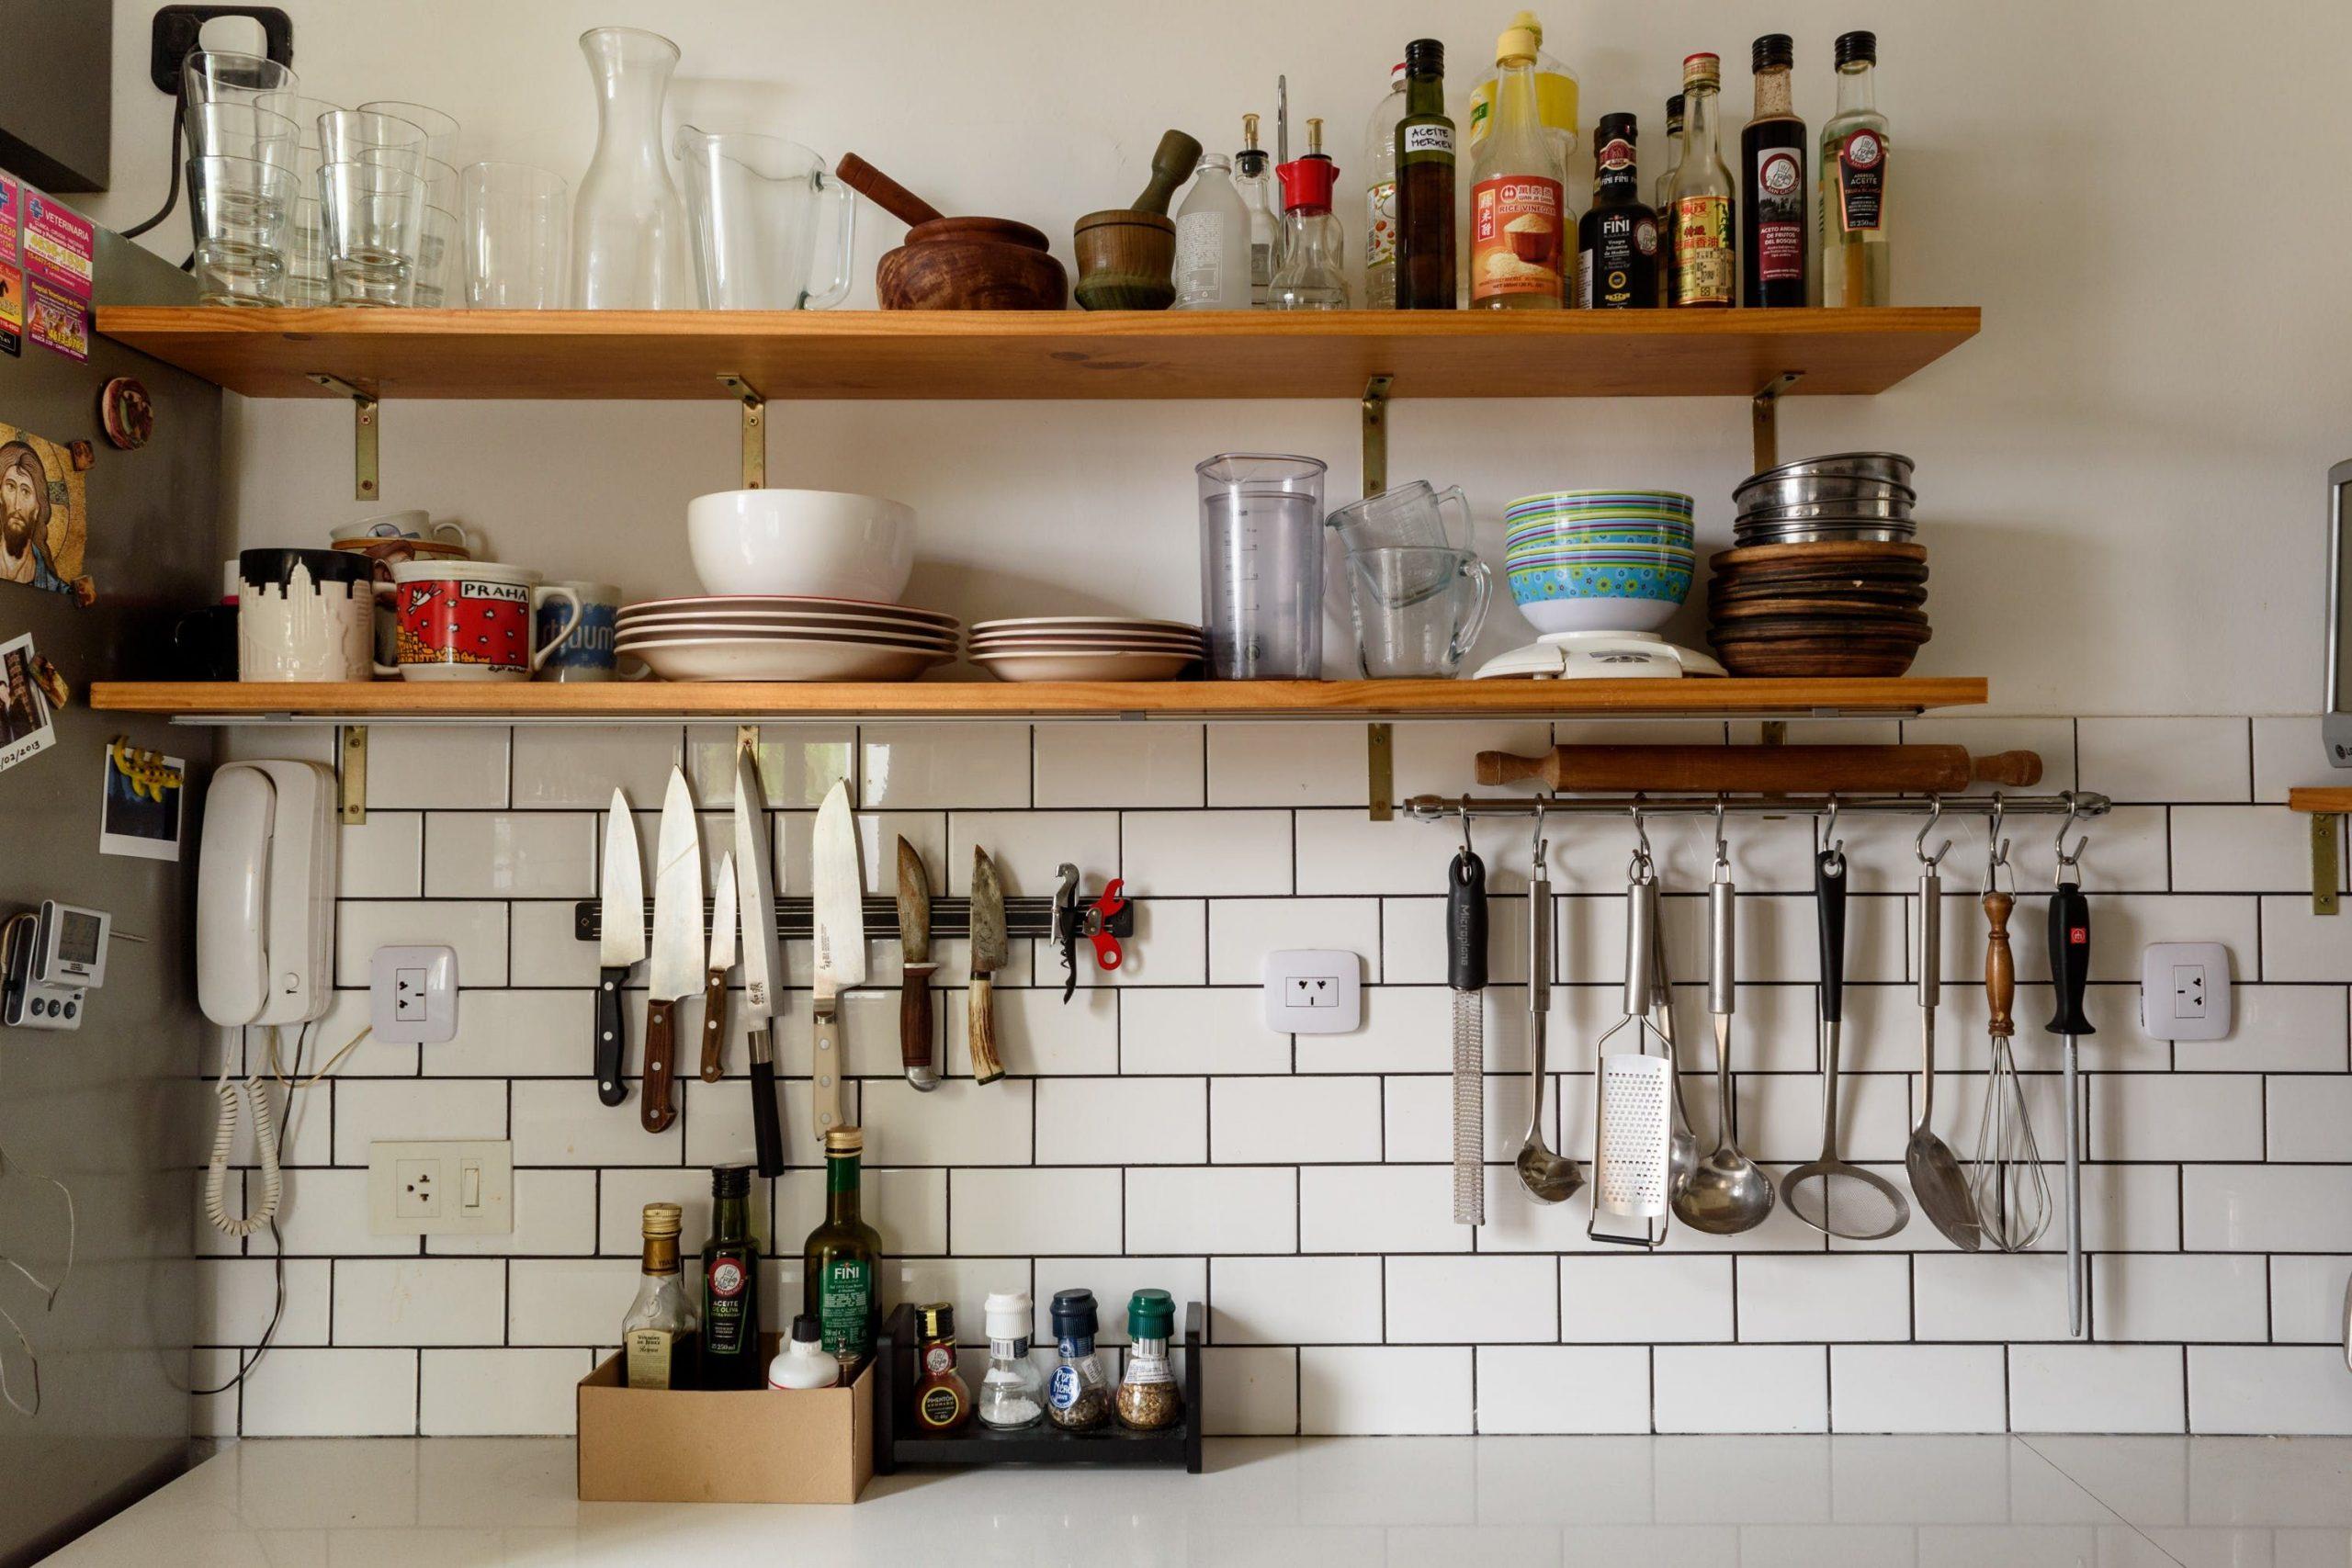 desain dapur kekinian dengan rak piring bergaya klasik scaled